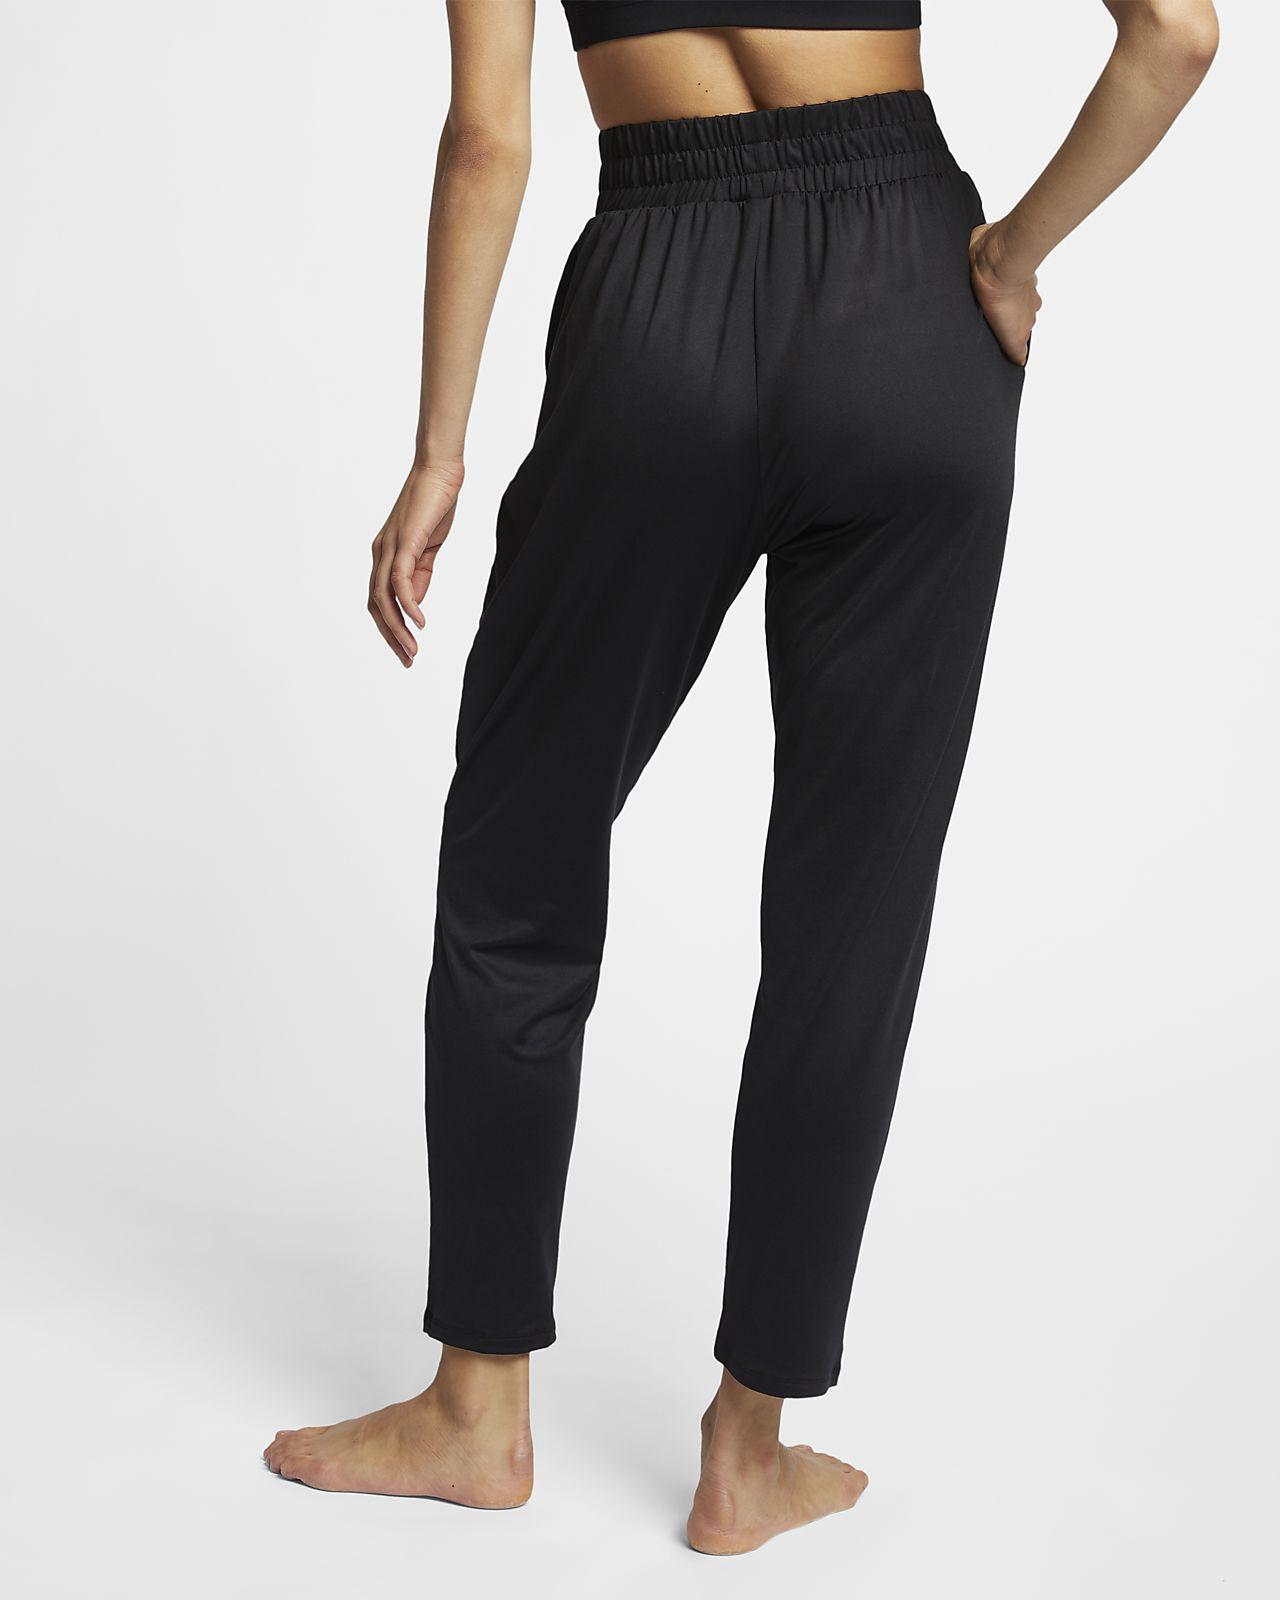 20095d3f1235 Nike Flow Women s Yoga Trousers. Nike.com BG